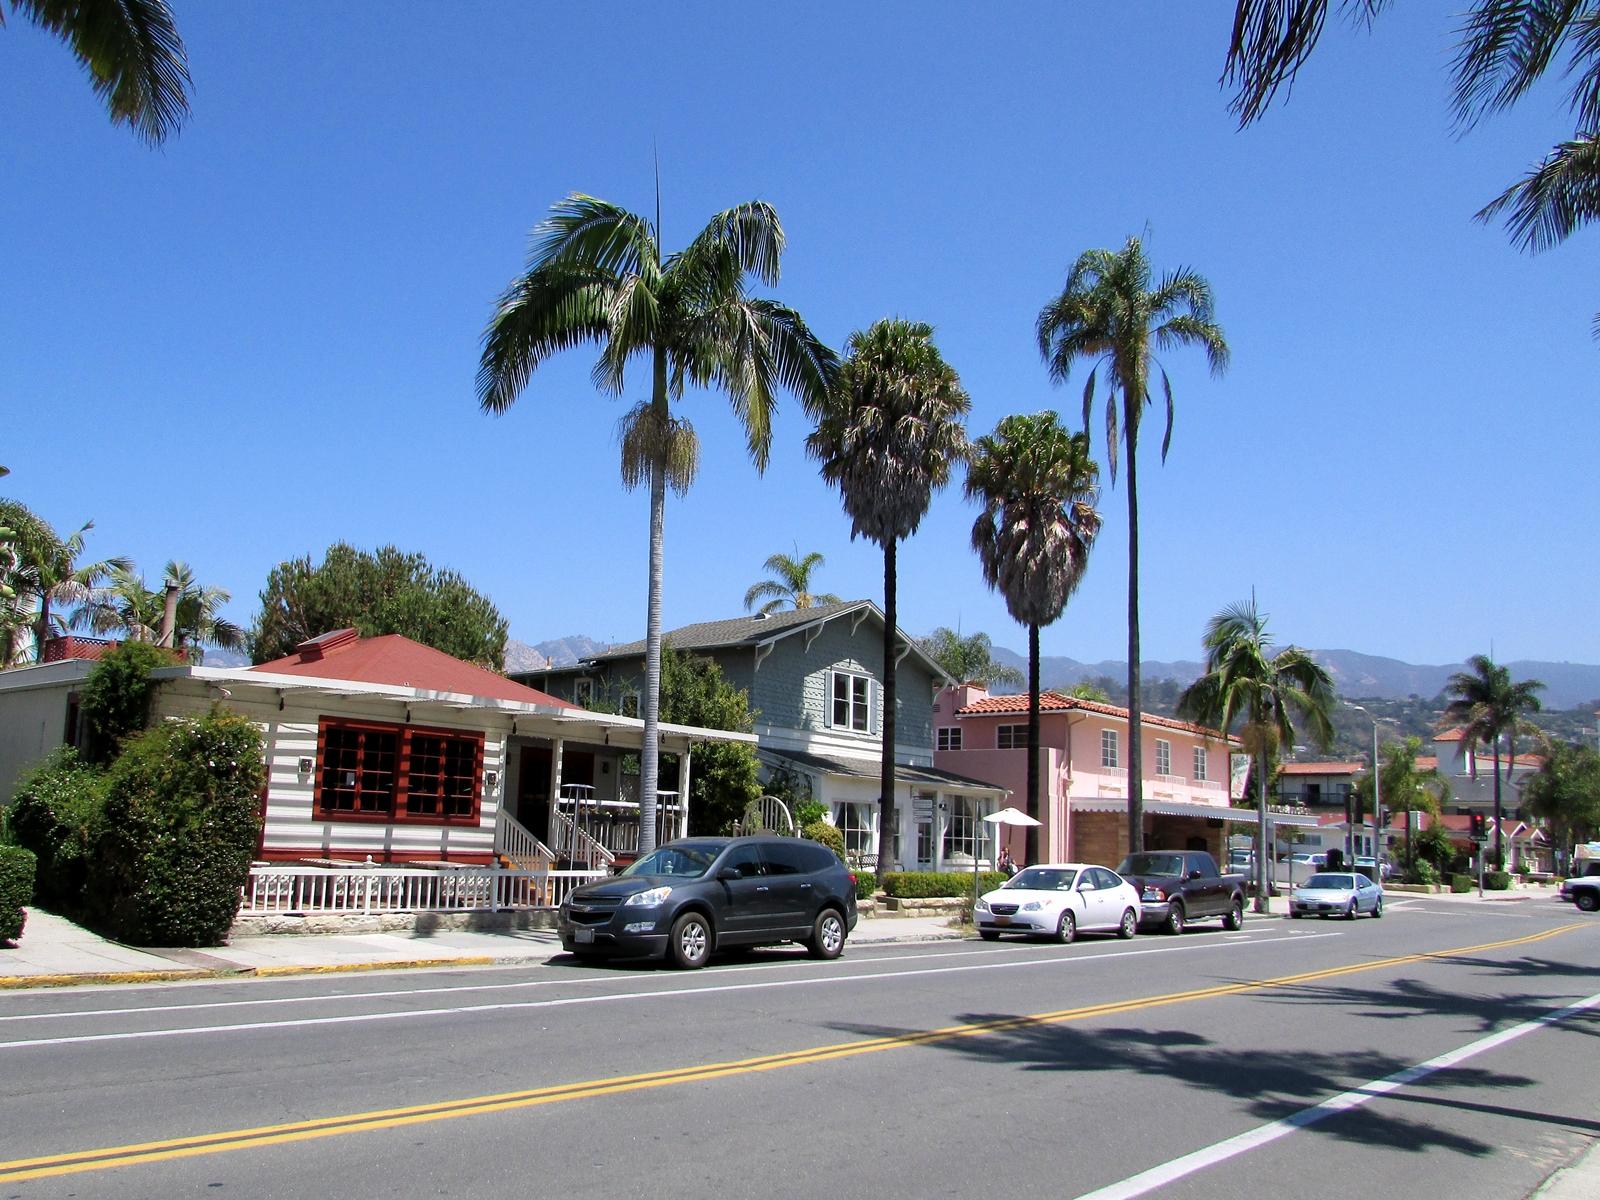 USA Rundreise - Amerika Westküste - Santa Barbara - Straße - Fashionladyloves by Tamara Wagner